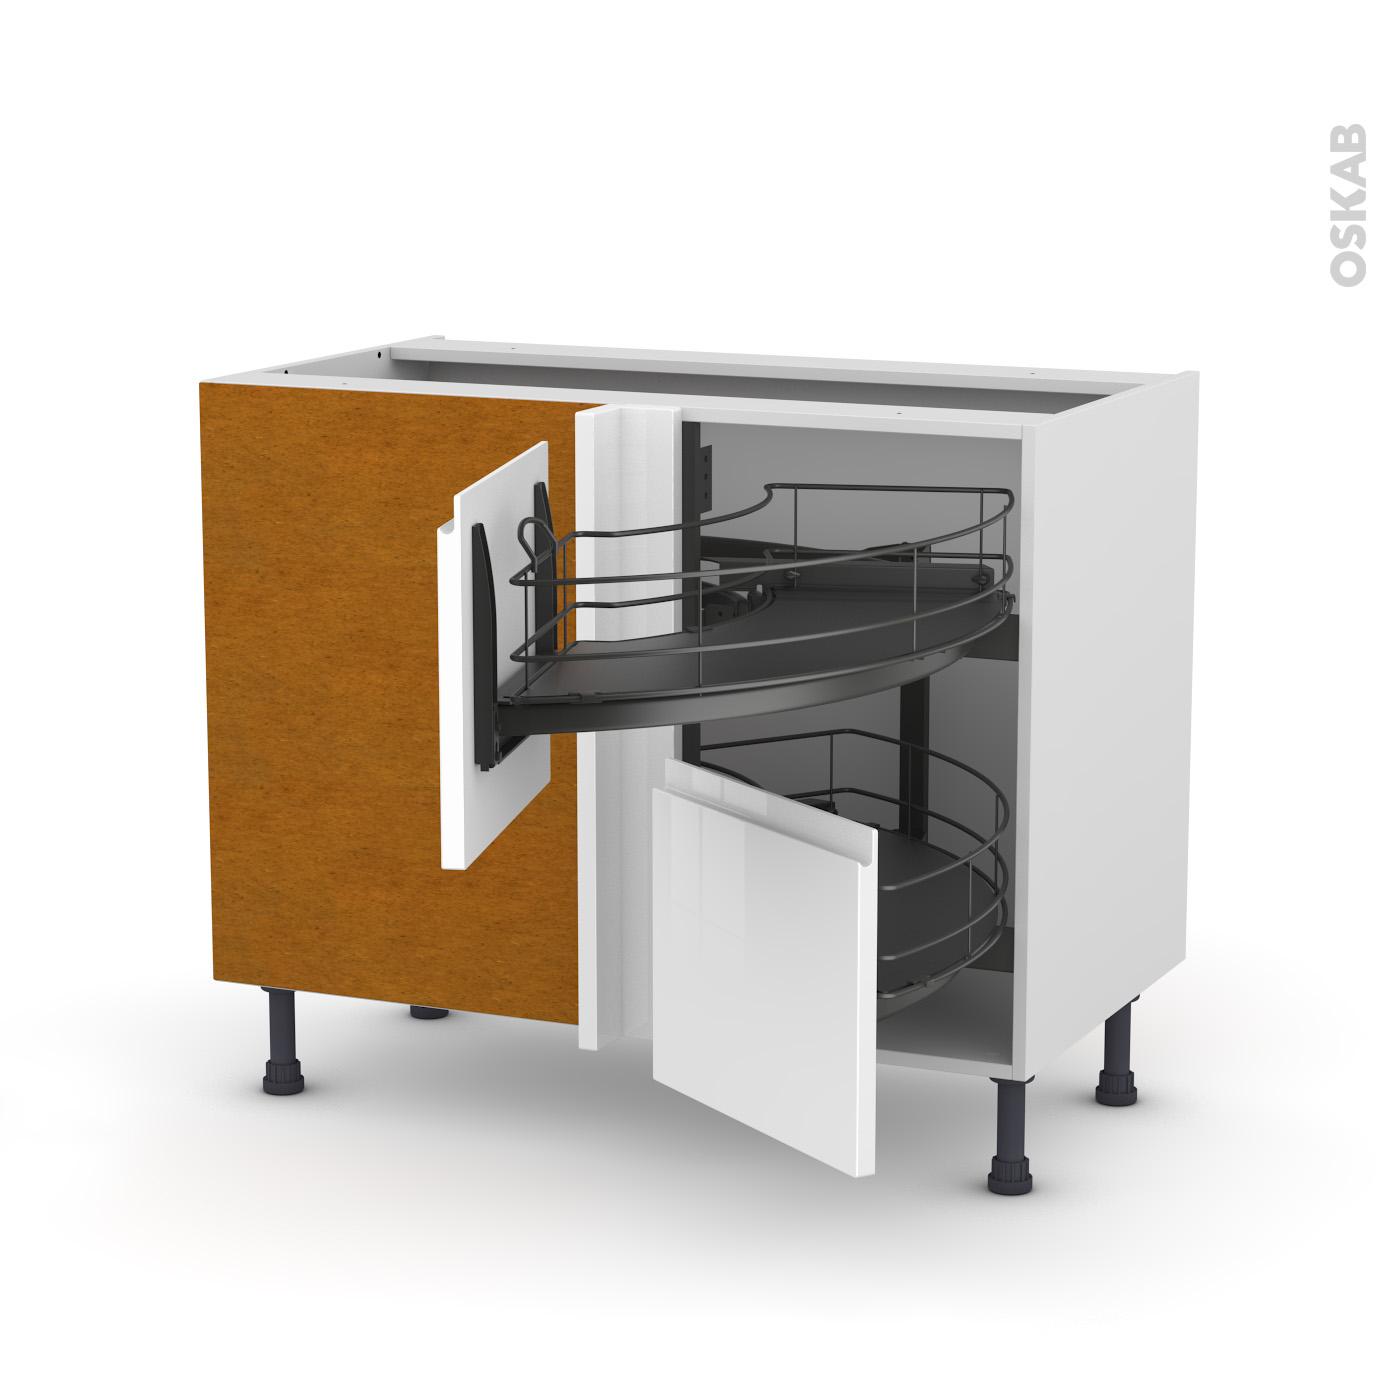 Meuble cuisine angle bas top ctb u meuble bas de cuisine Demi lune meuble cuisine